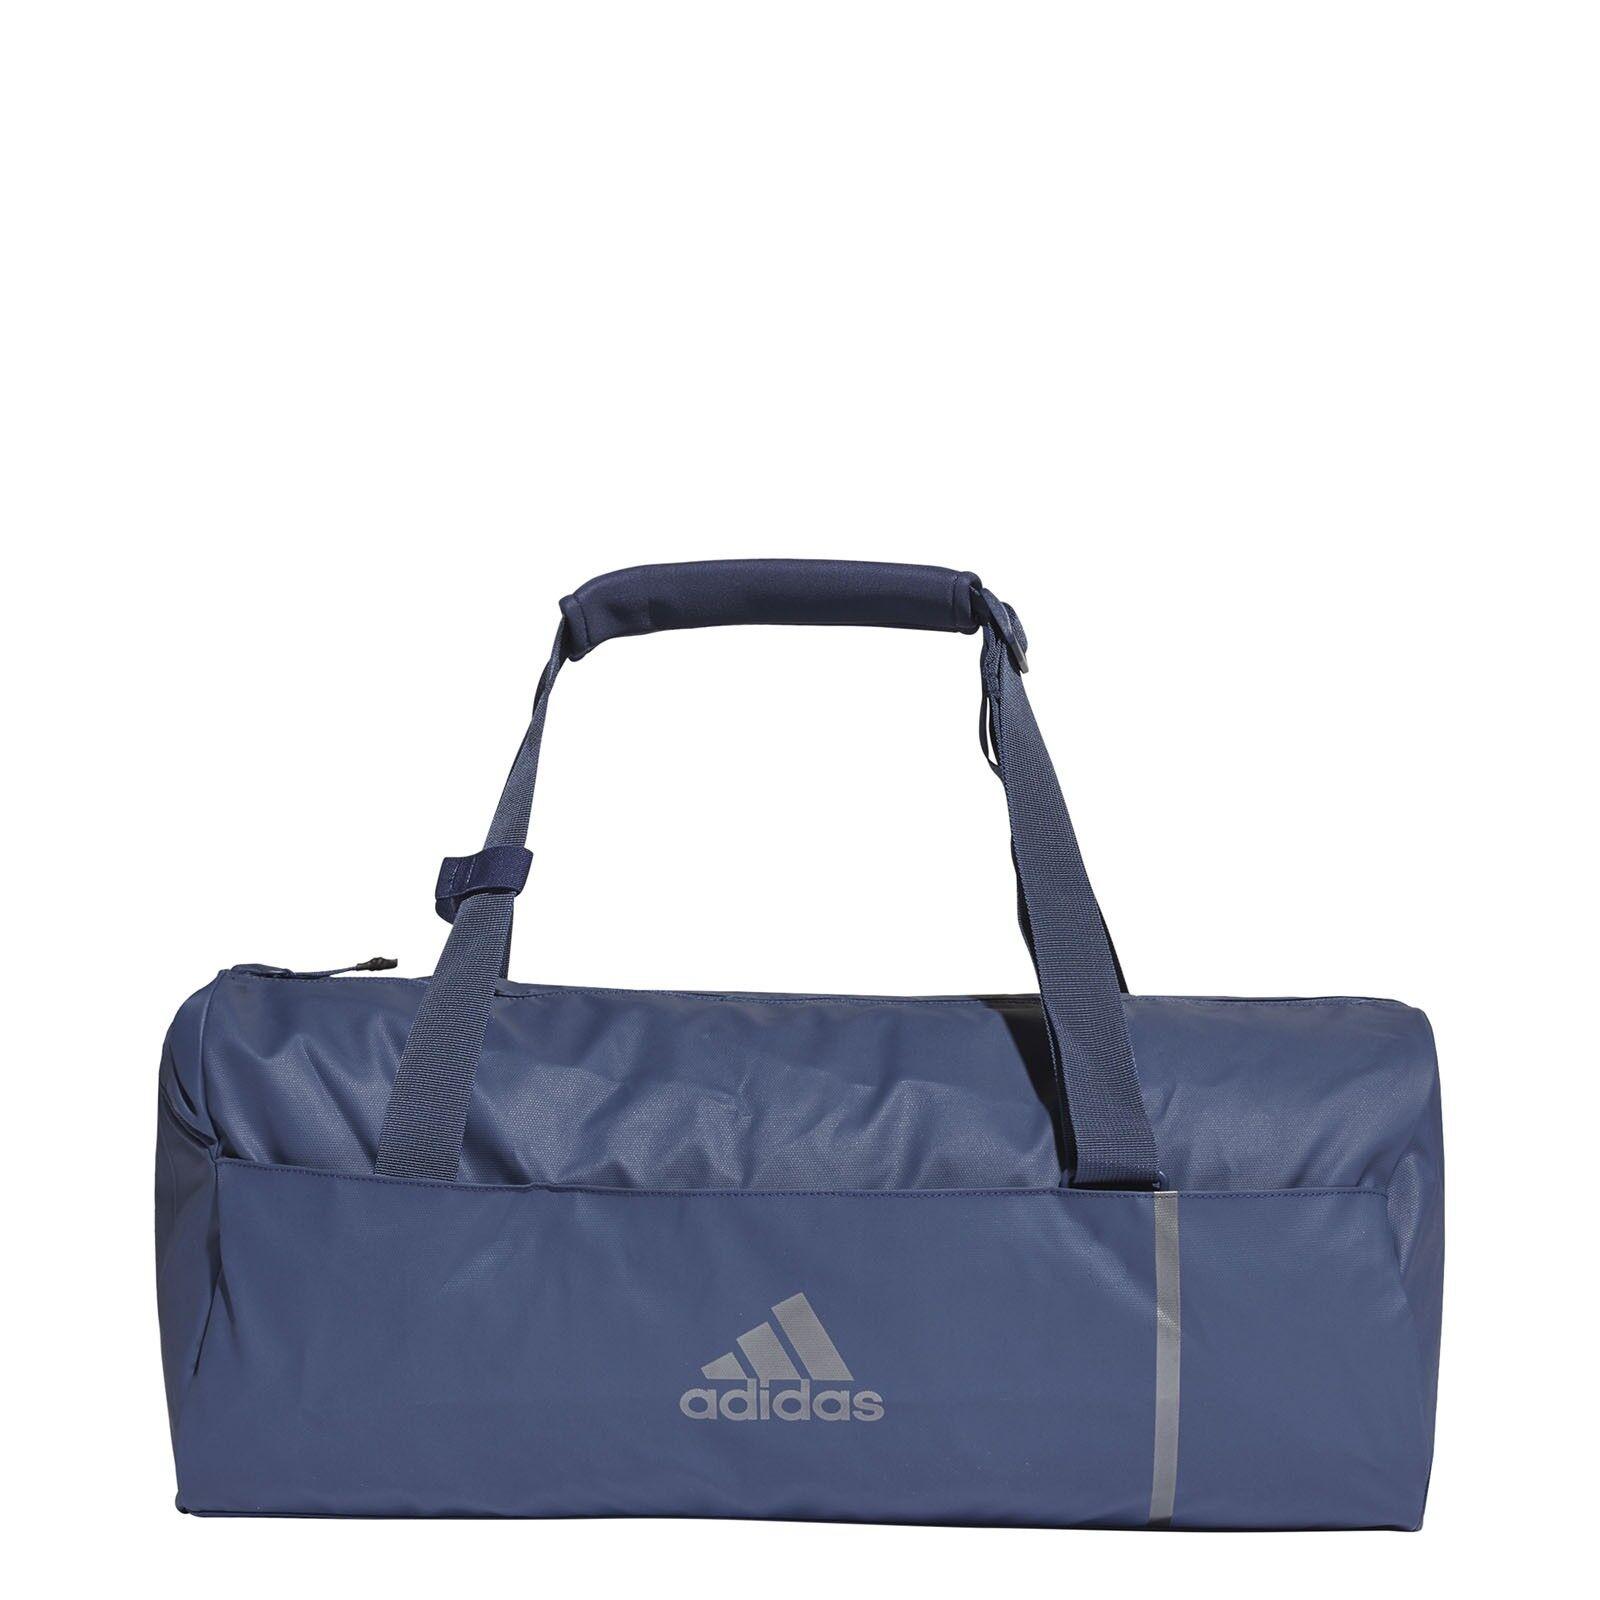 Adidas Performance Sporttasche TR CVRT CVRT CVRT DUF M blau (CF3272) 8870a9